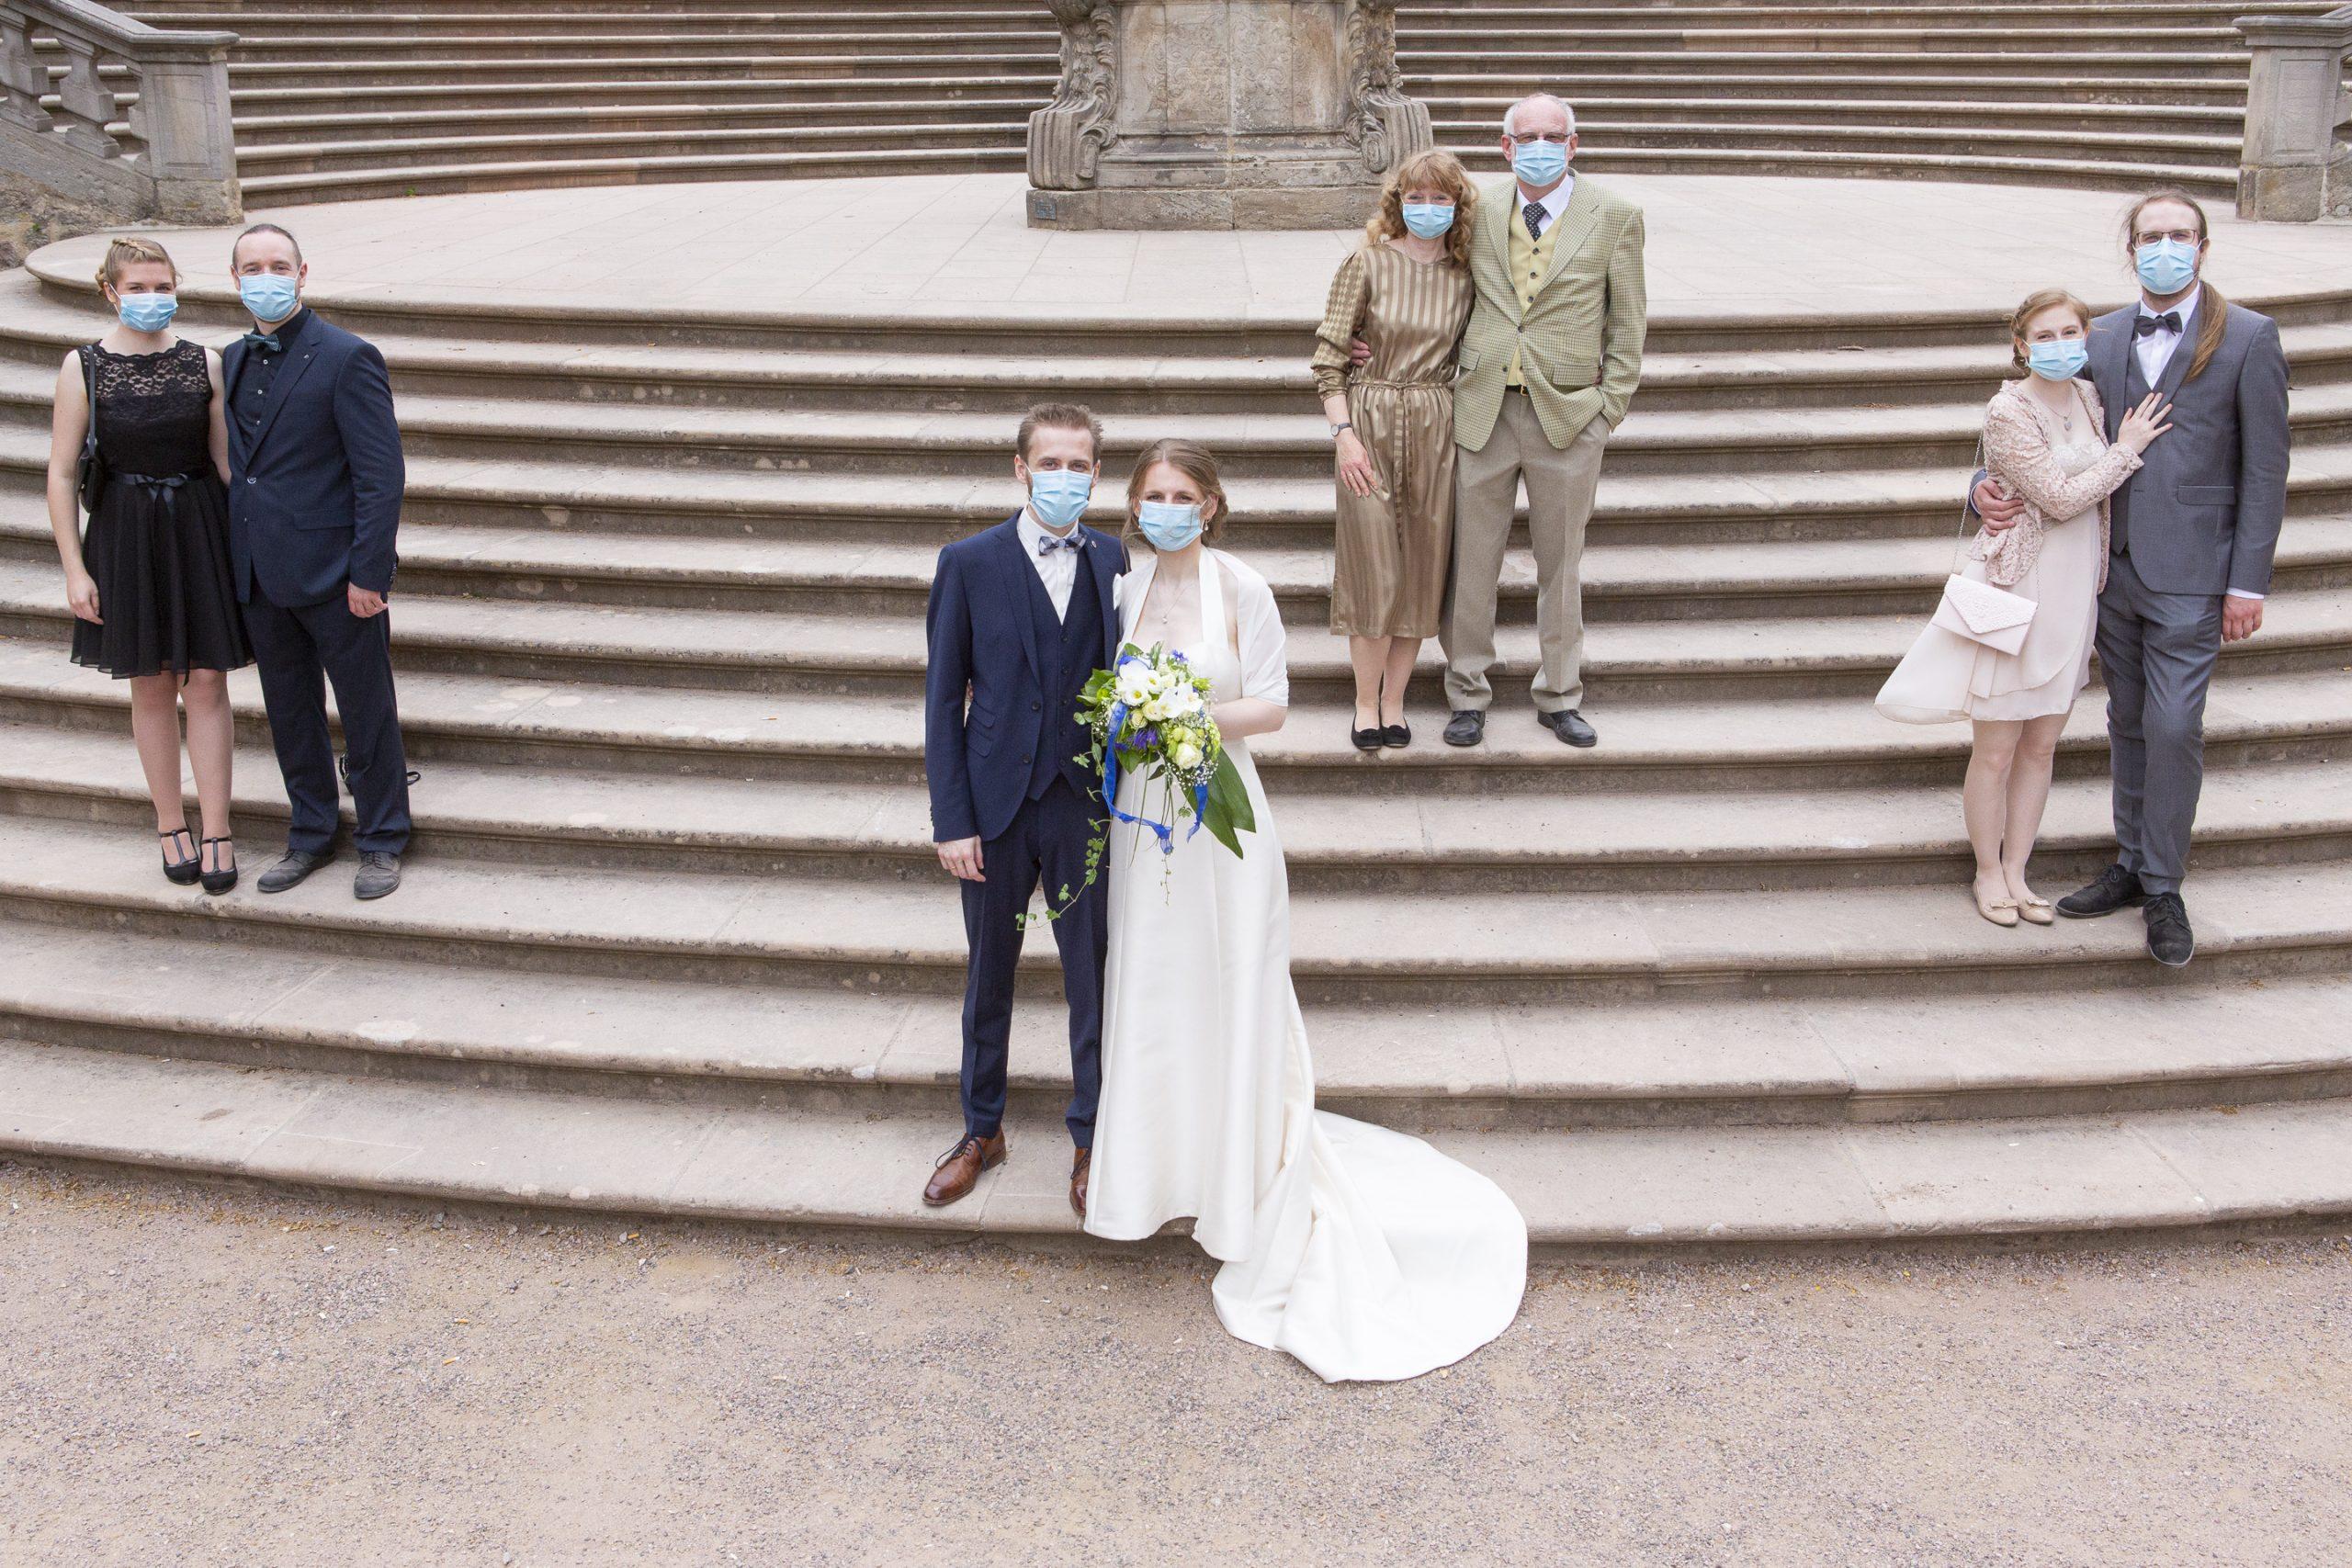 Mettmann Hochzeit Corona